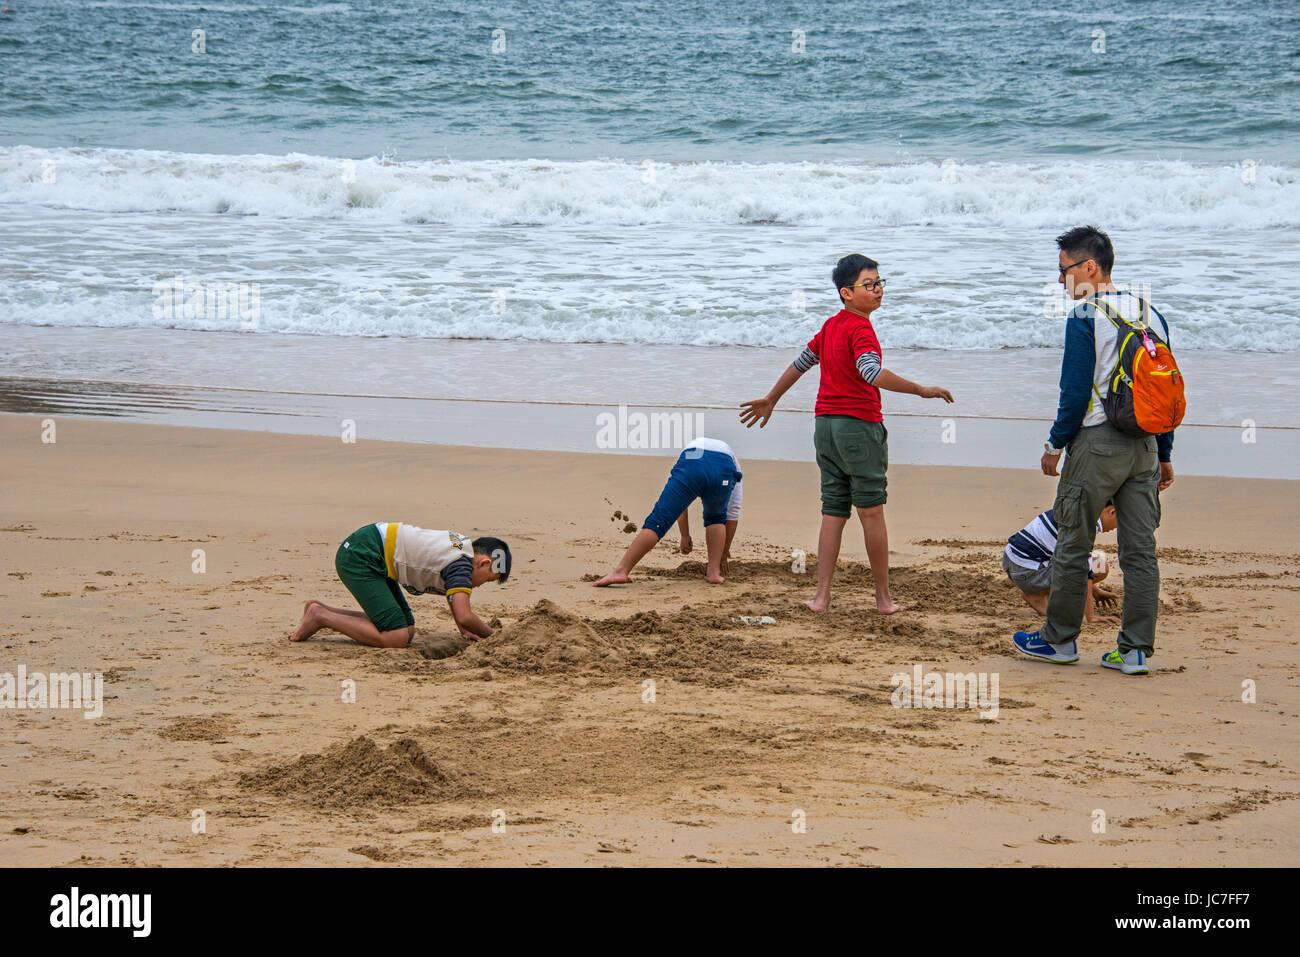 Children Playing on Sandy Beach, Hong Kong - Stock Image